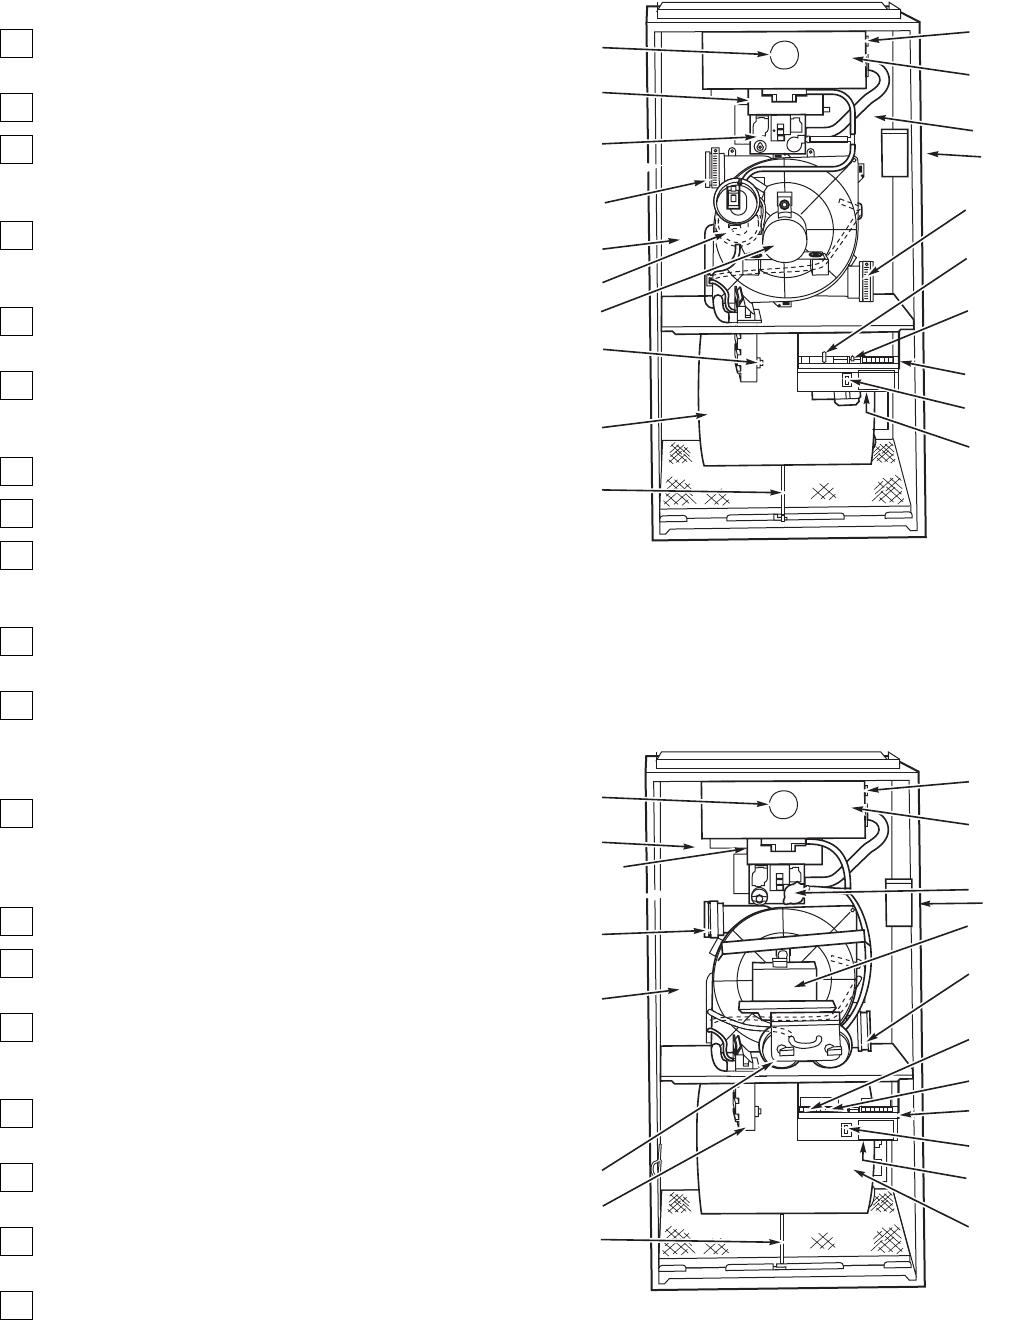 upflow furnace diagram